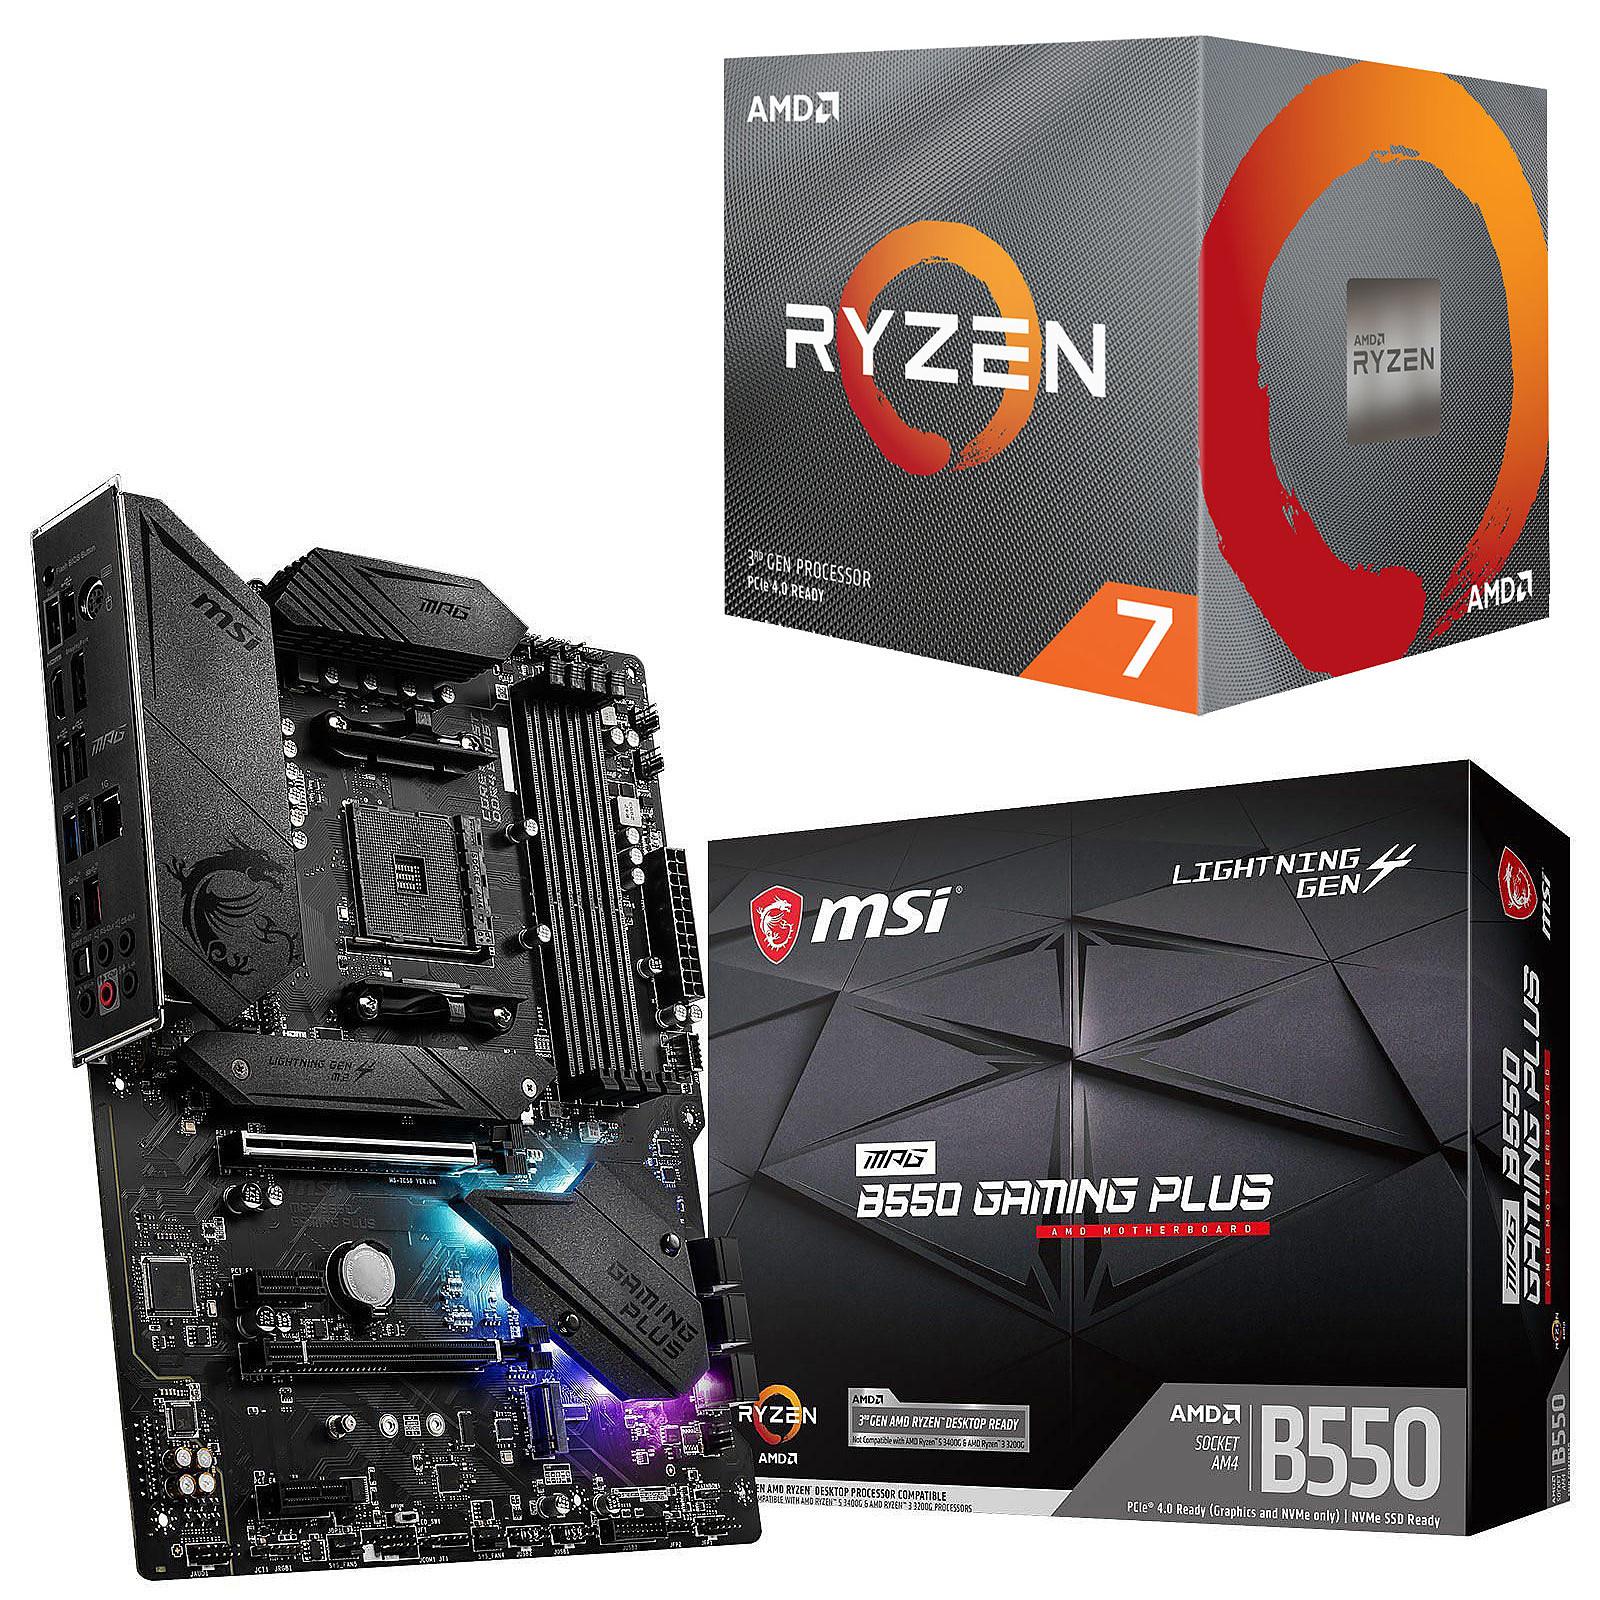 Kit Upgrade PC AMD Ryzen 7 3700X MSI MPG B550 GAMING PLUS